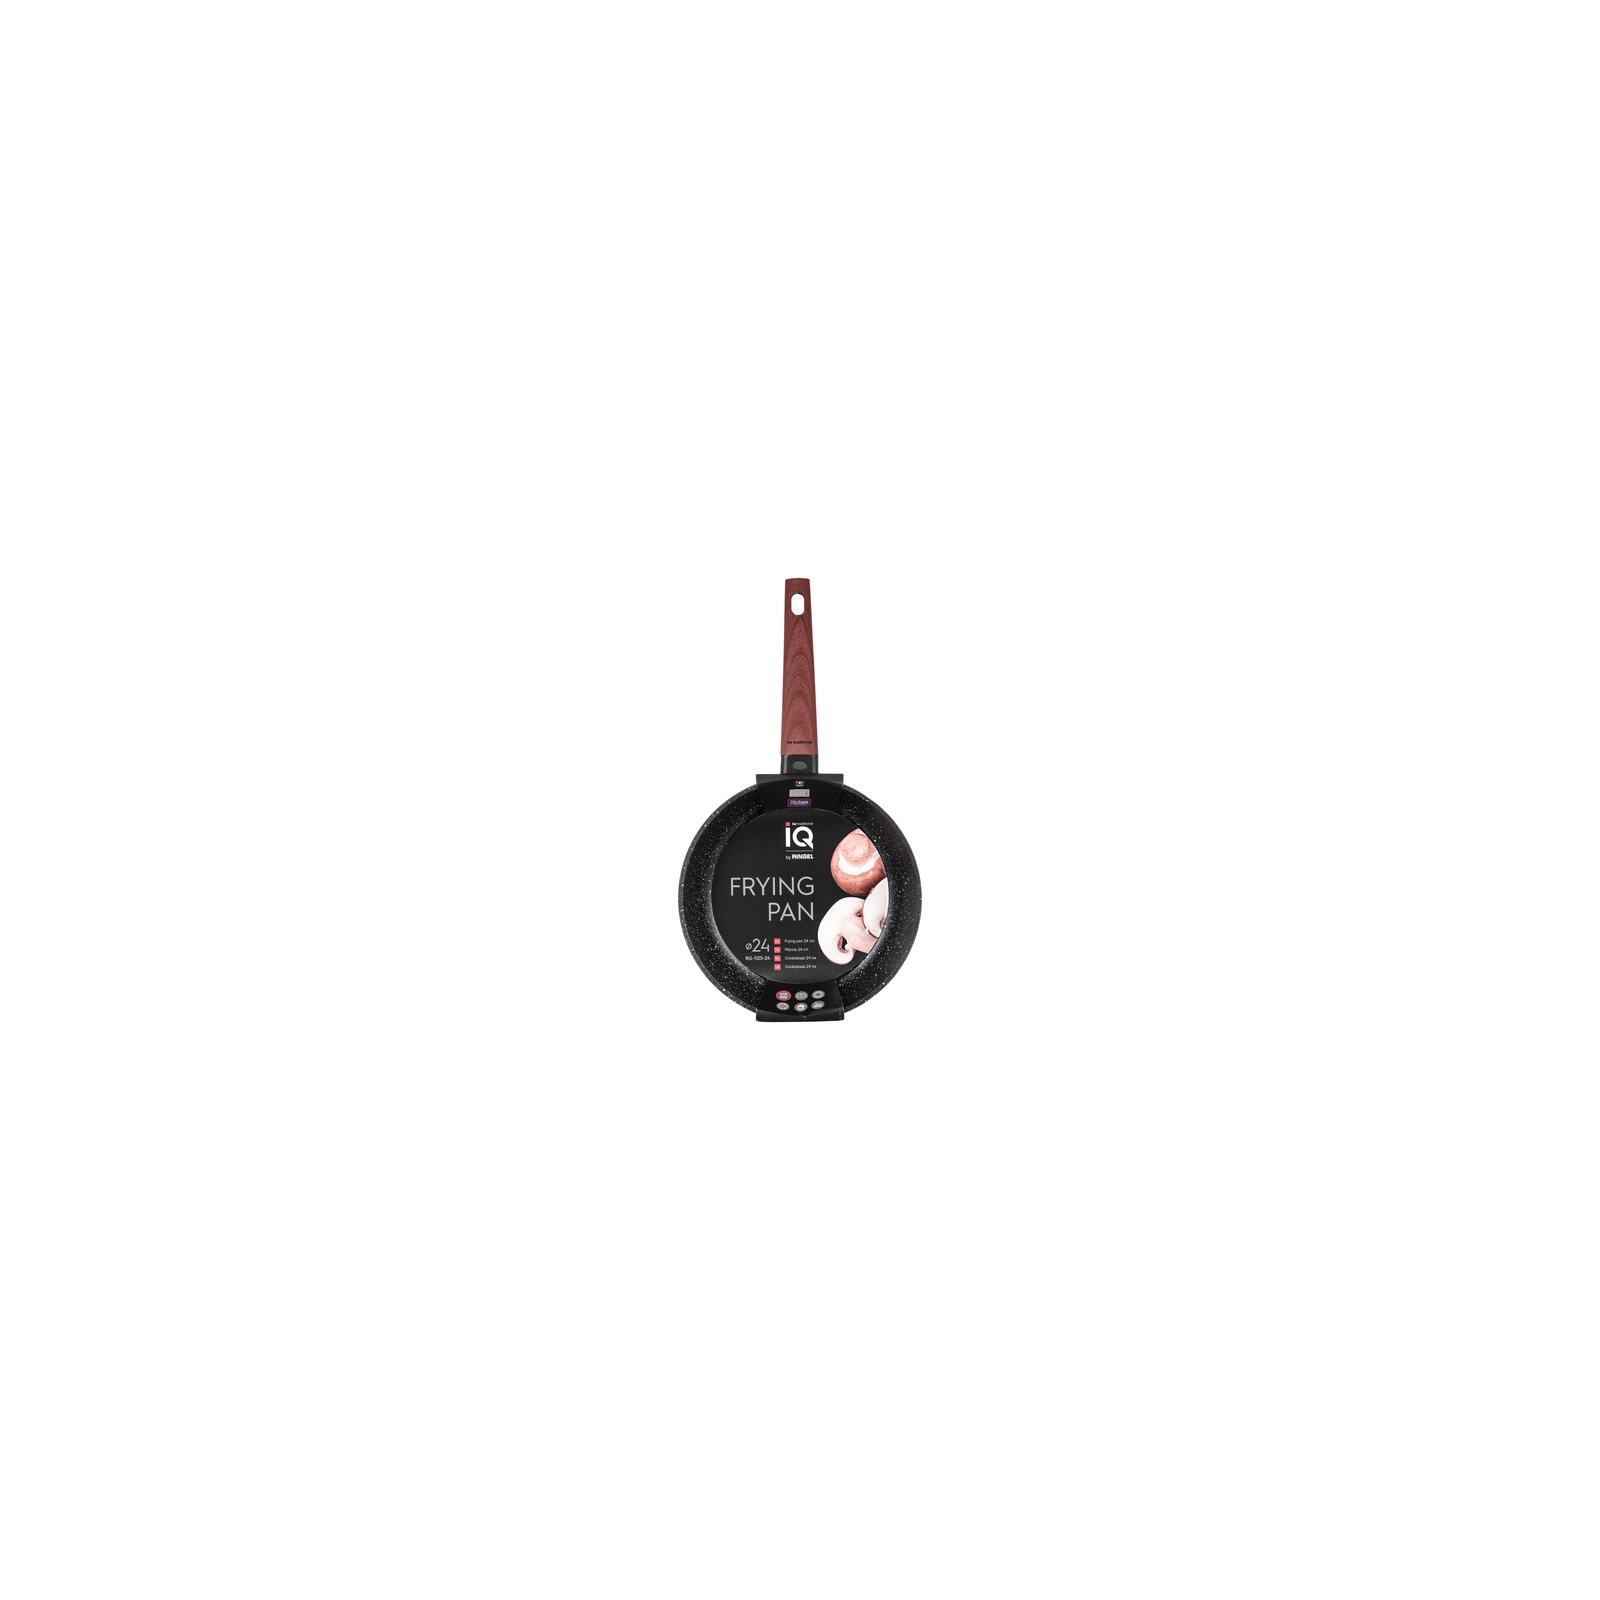 Сковорода Ringel IQ Traditional 24 см (RG-1125-24) изображение 7